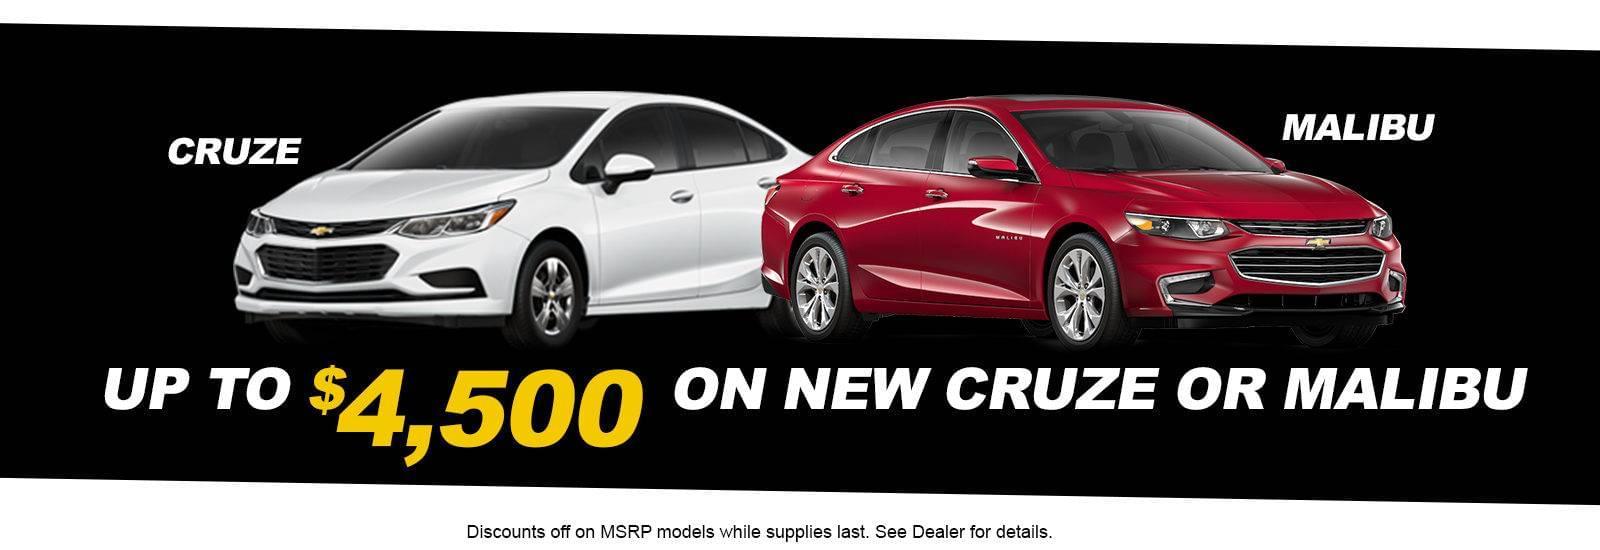 2006 Chevrolet Tahoe Discounts Upcomingcarshq Com